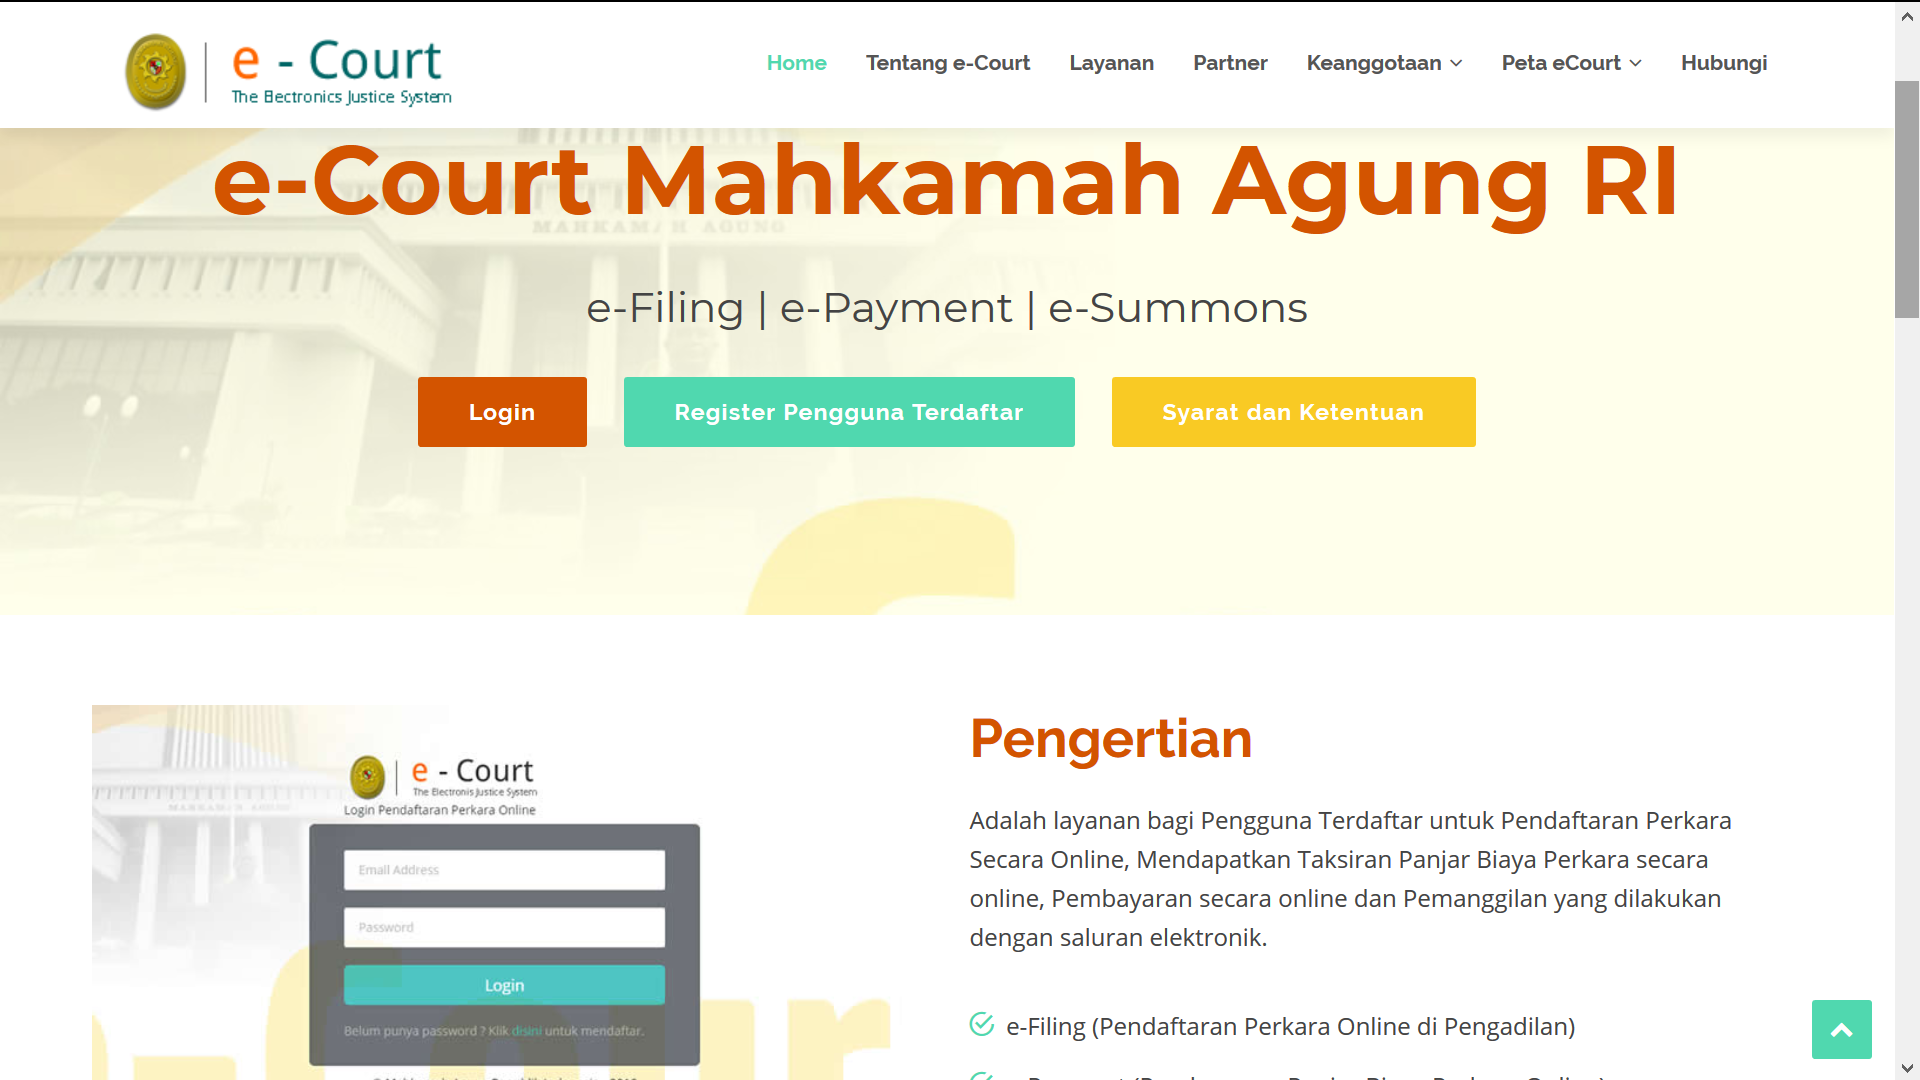 E-Court MA RI